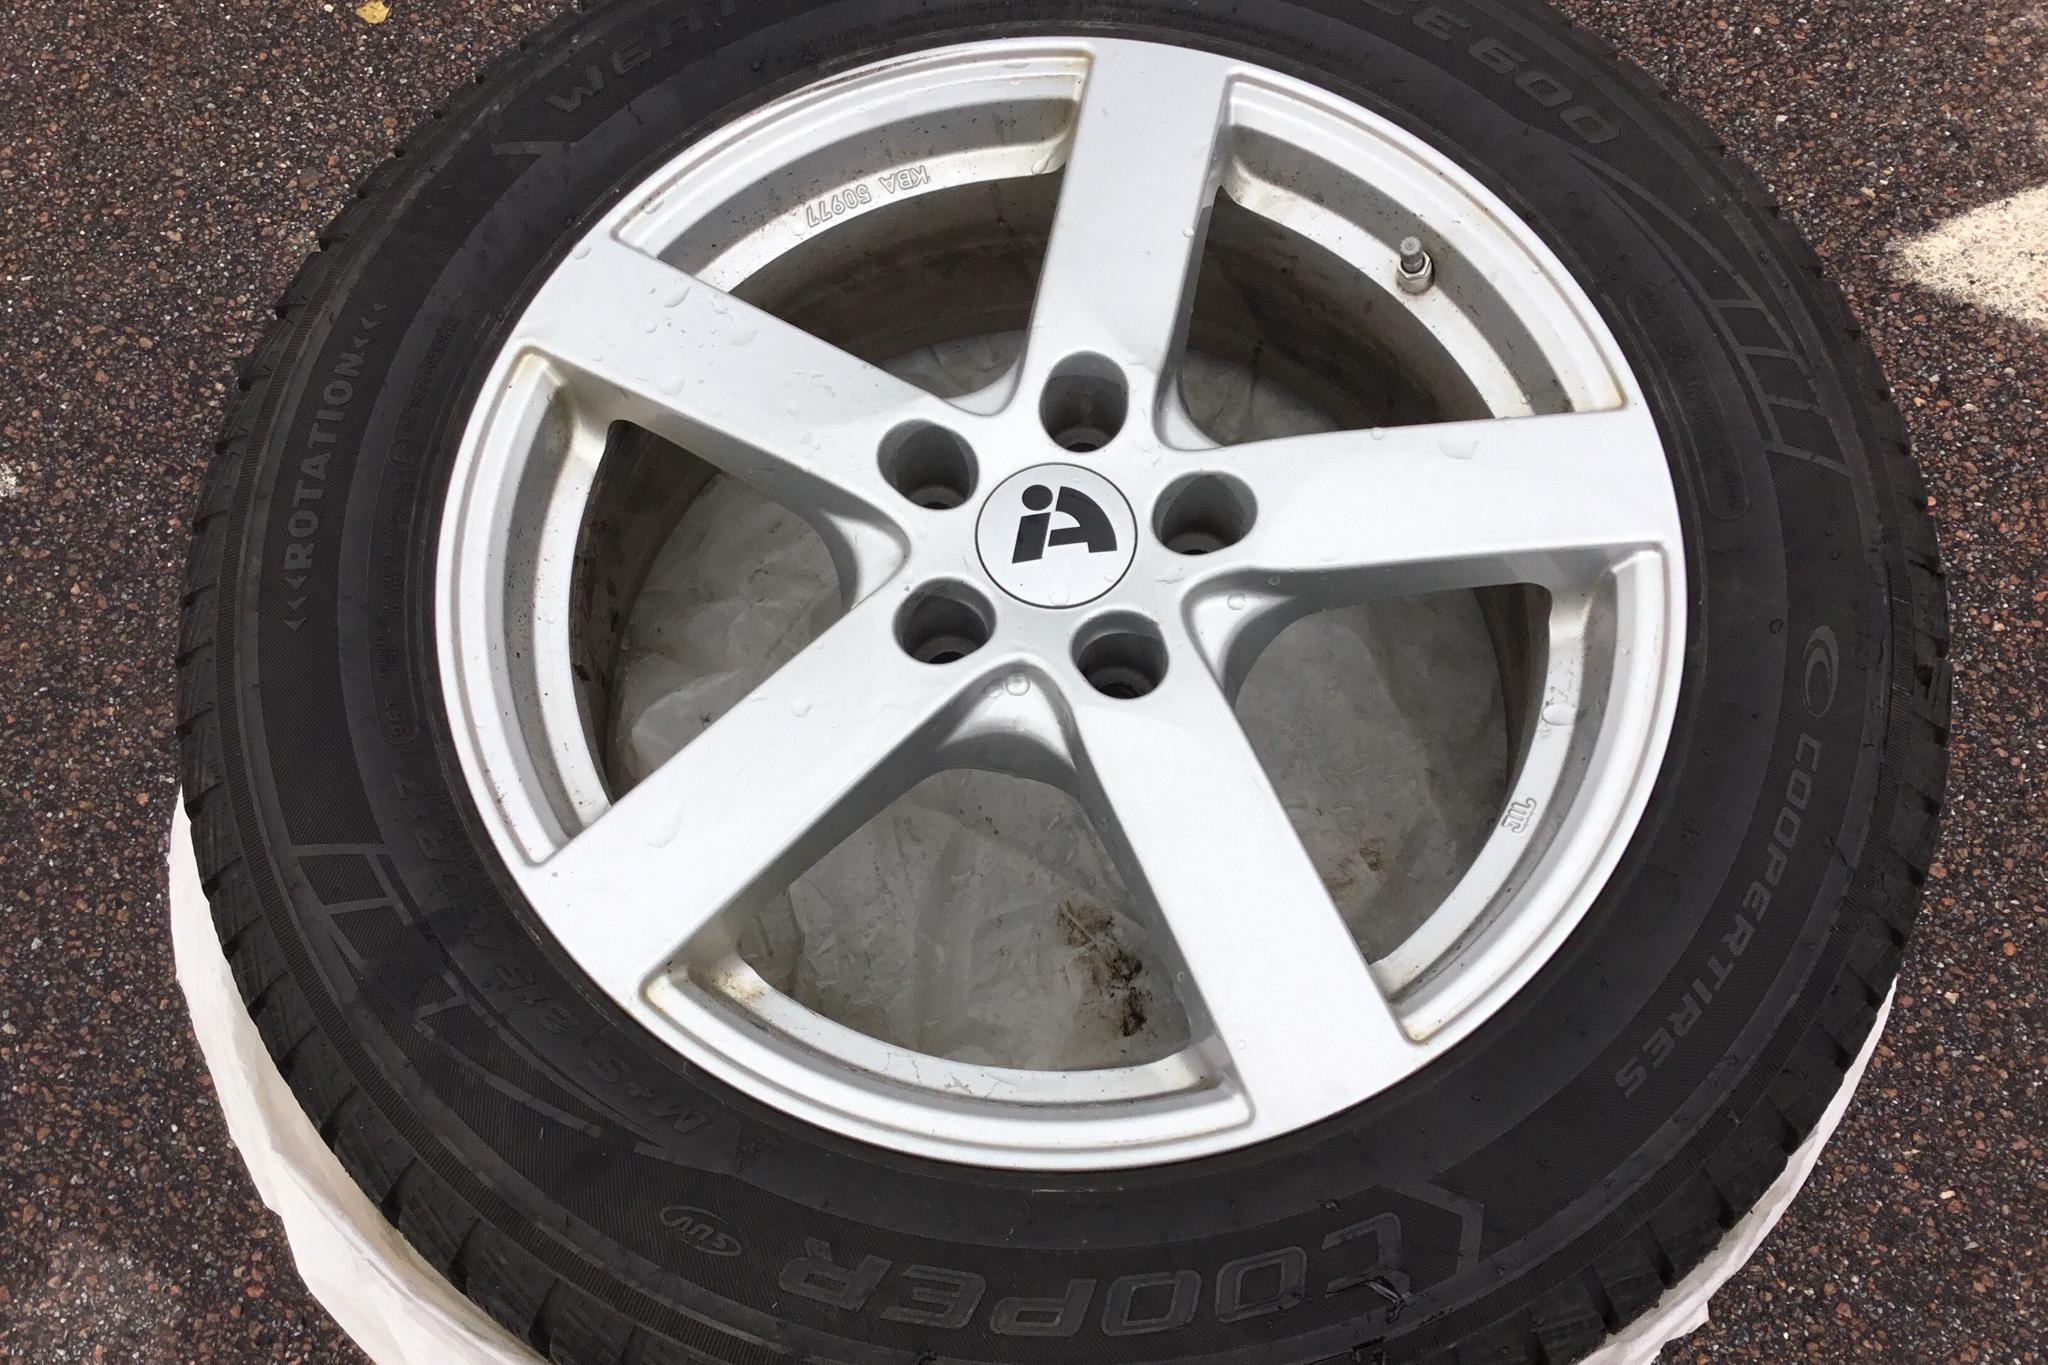 Nissan Qashqai 1.5 dCi (110hk) - 90 620 km - Manual - white - 2016